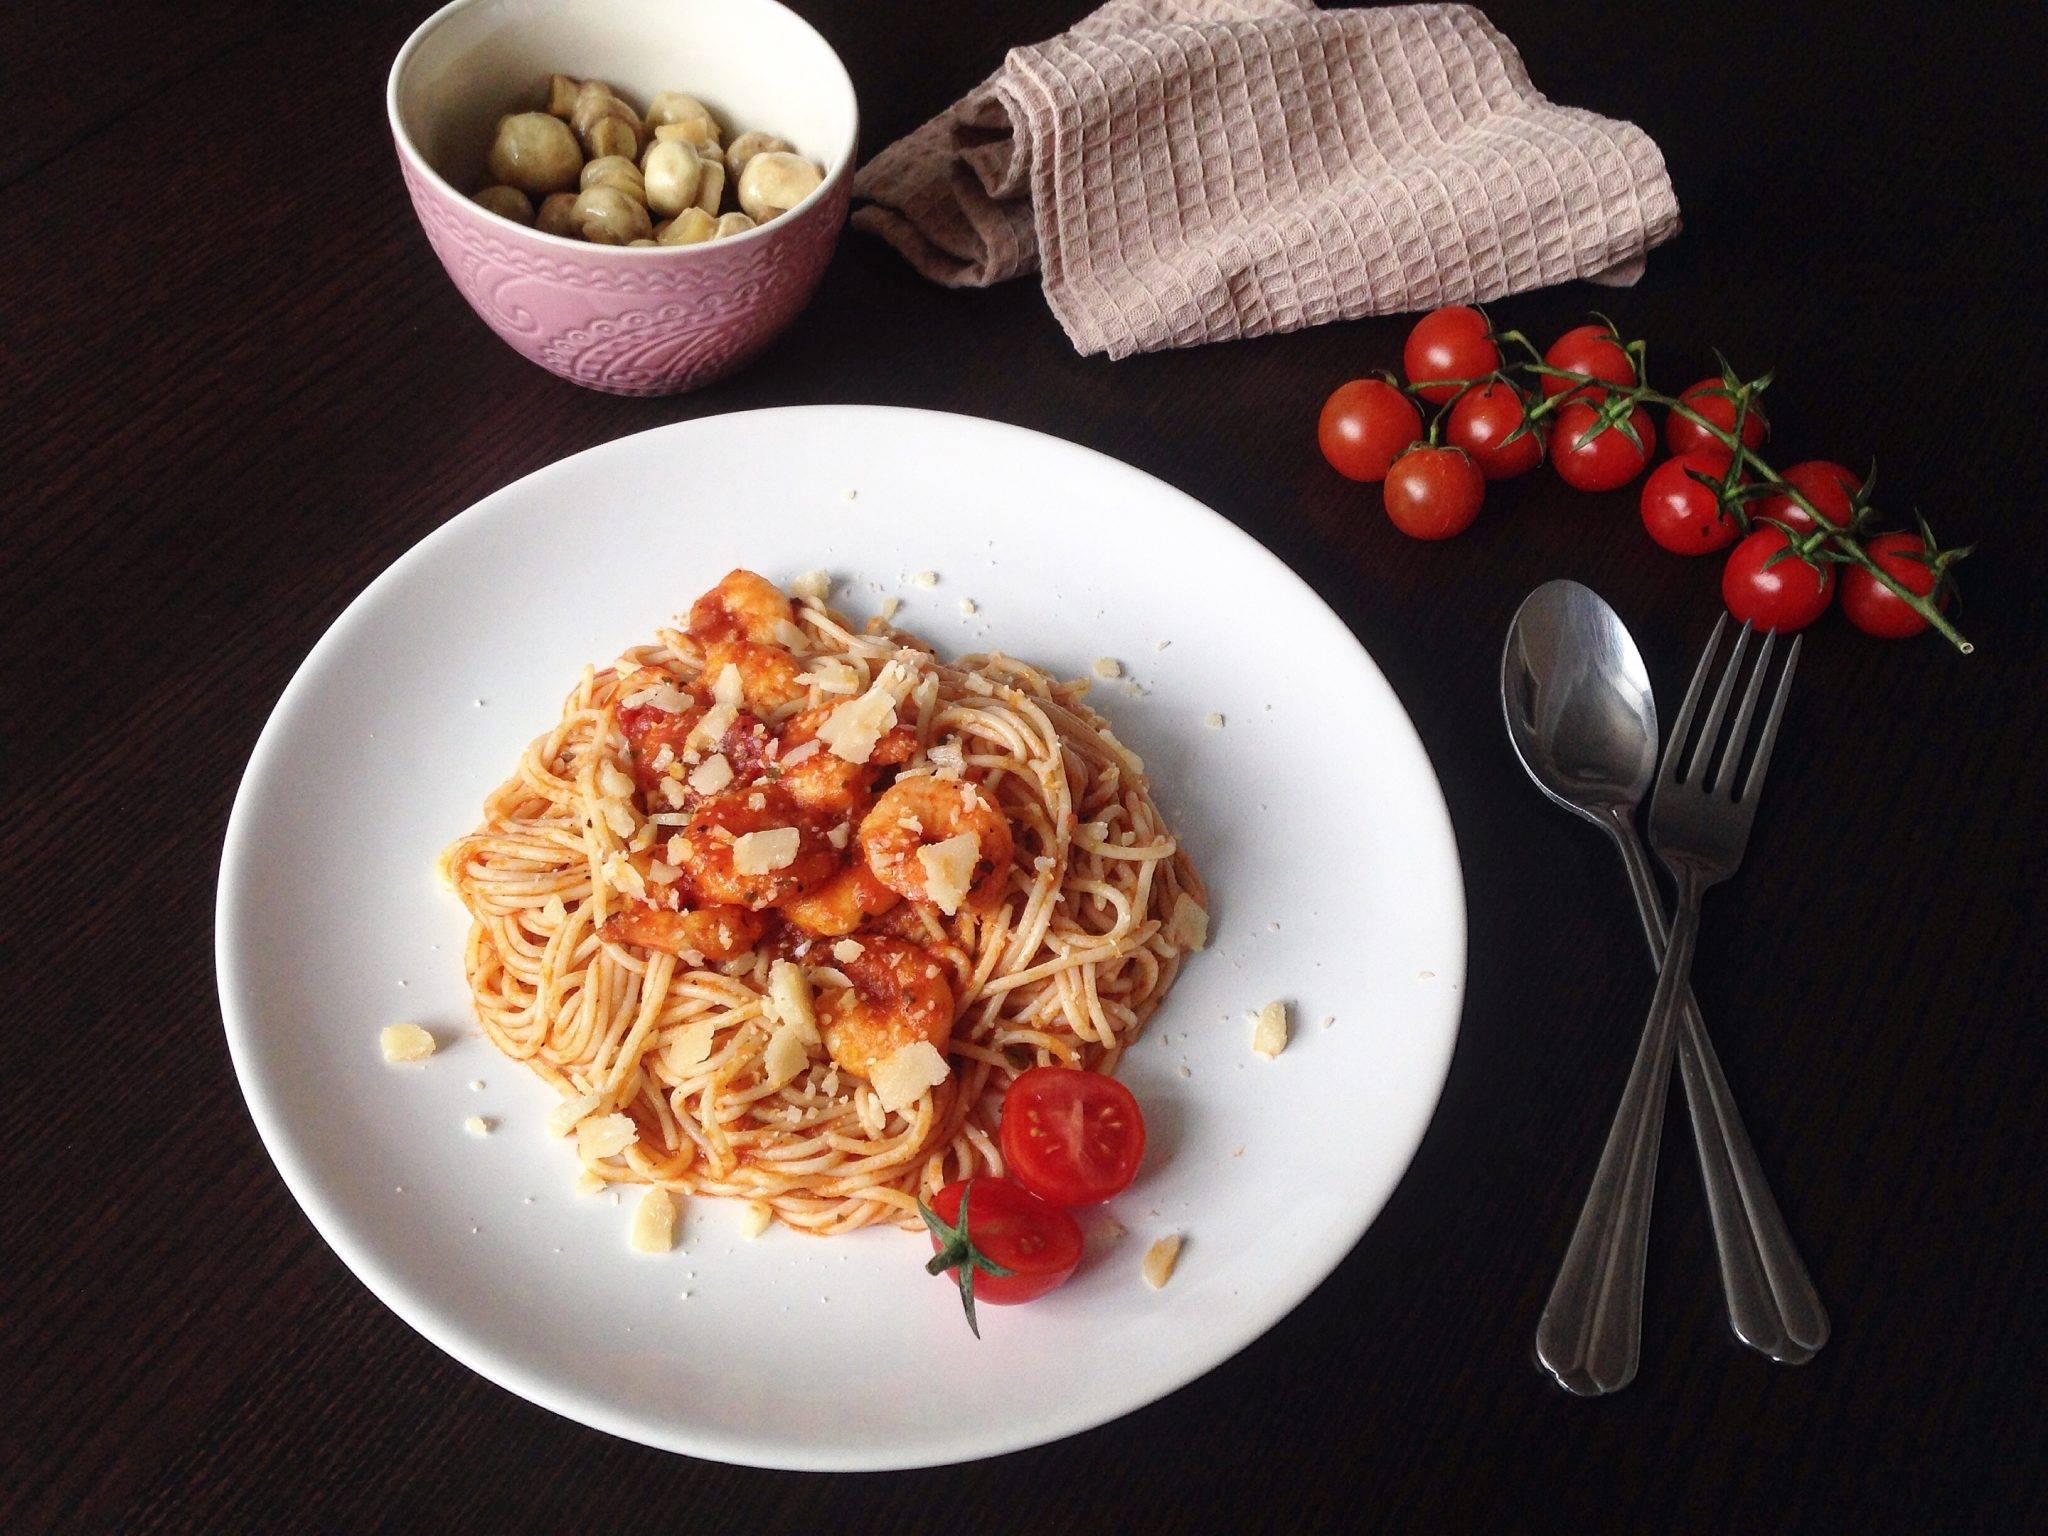 Соус долмио: готовим по рецепту в домашних условиях